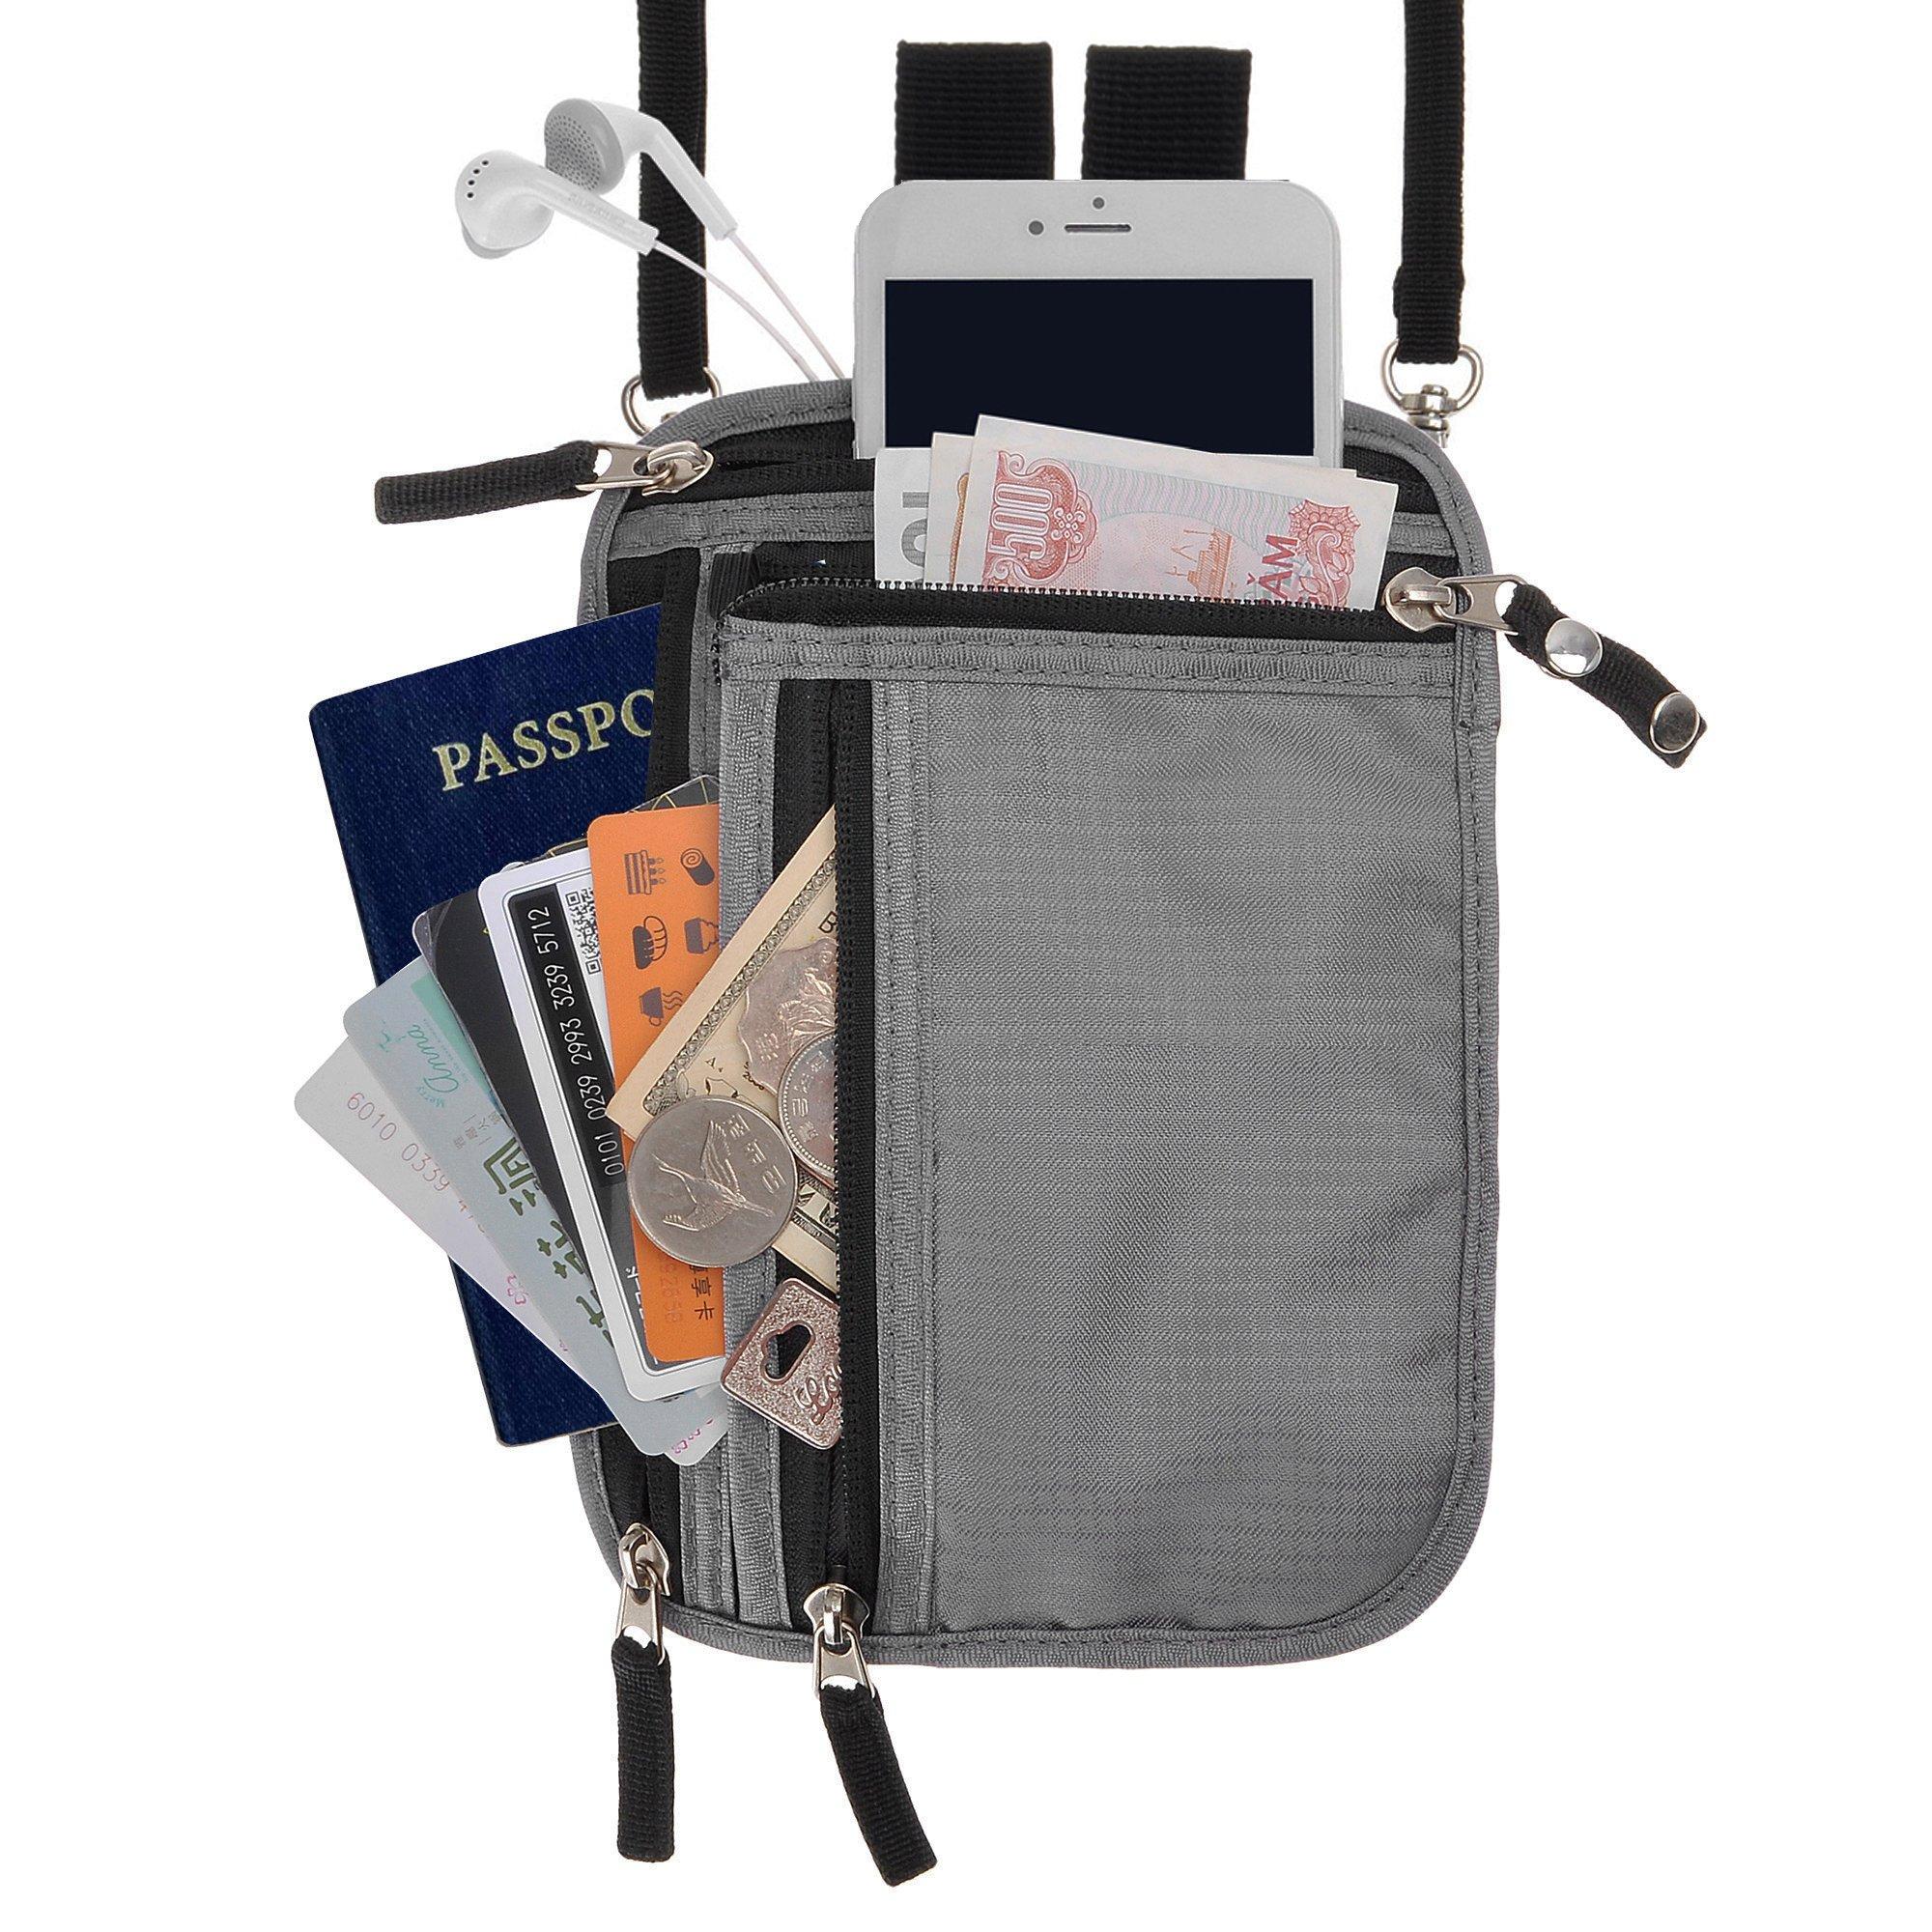 RFID Blocking 2-in-1 Travel Neck Stash and Belt Wallet Security Hidden Passport Holder Pouch by ZLYC (Image #1)